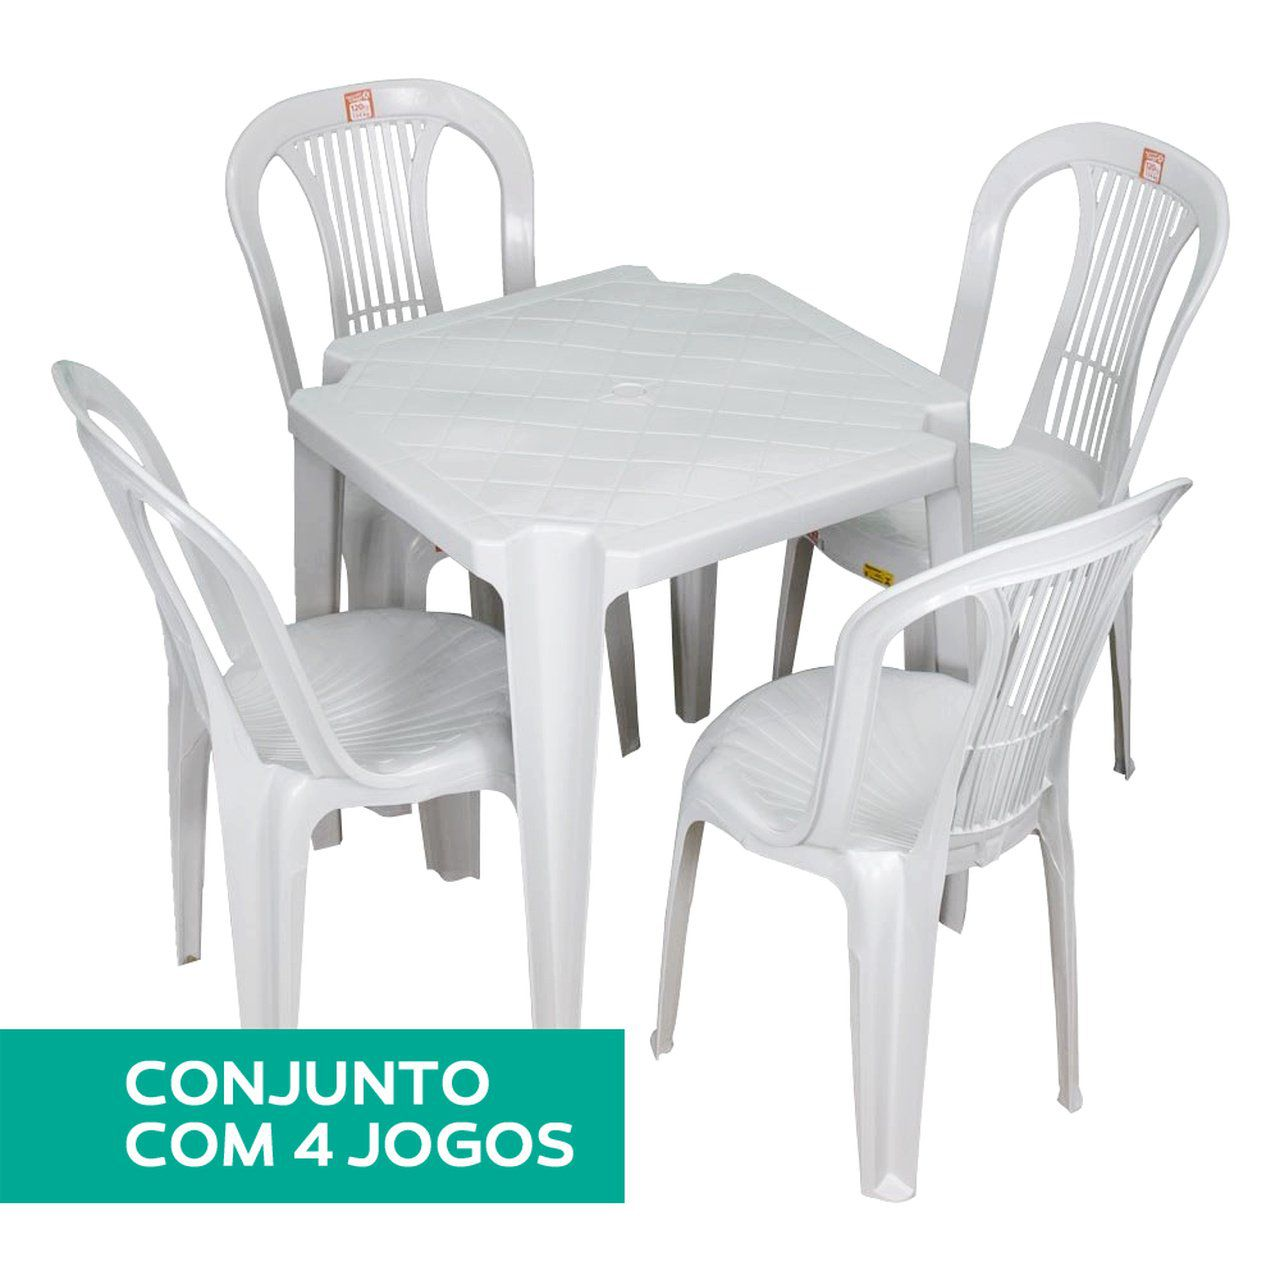 Mesa de Plástico Kit com 4 Mesas e  16 Cadeiras